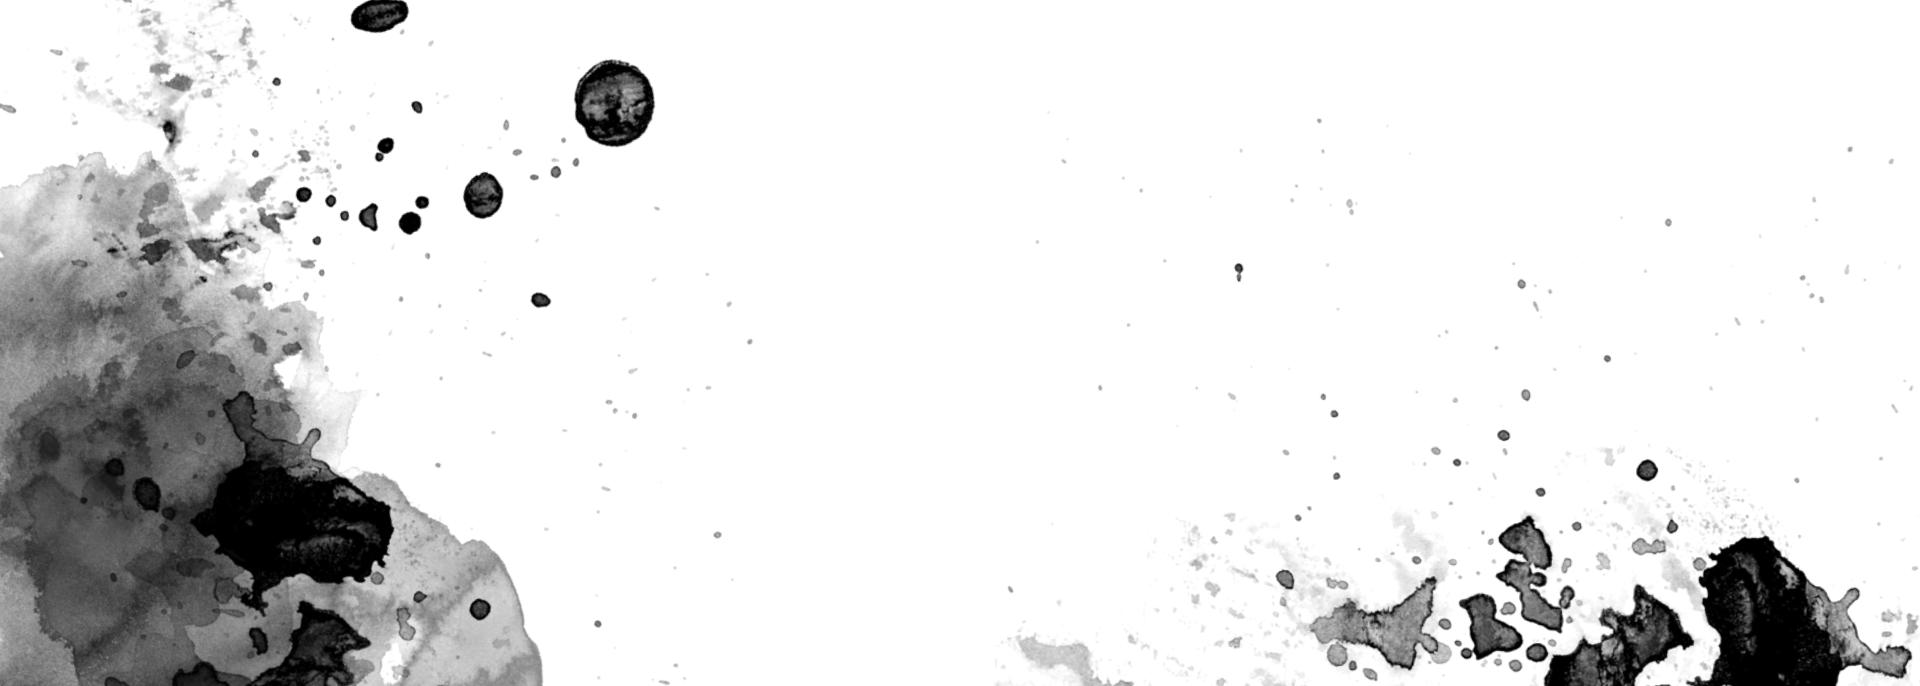 Illustration mit schwarzem Aquarell Fleck